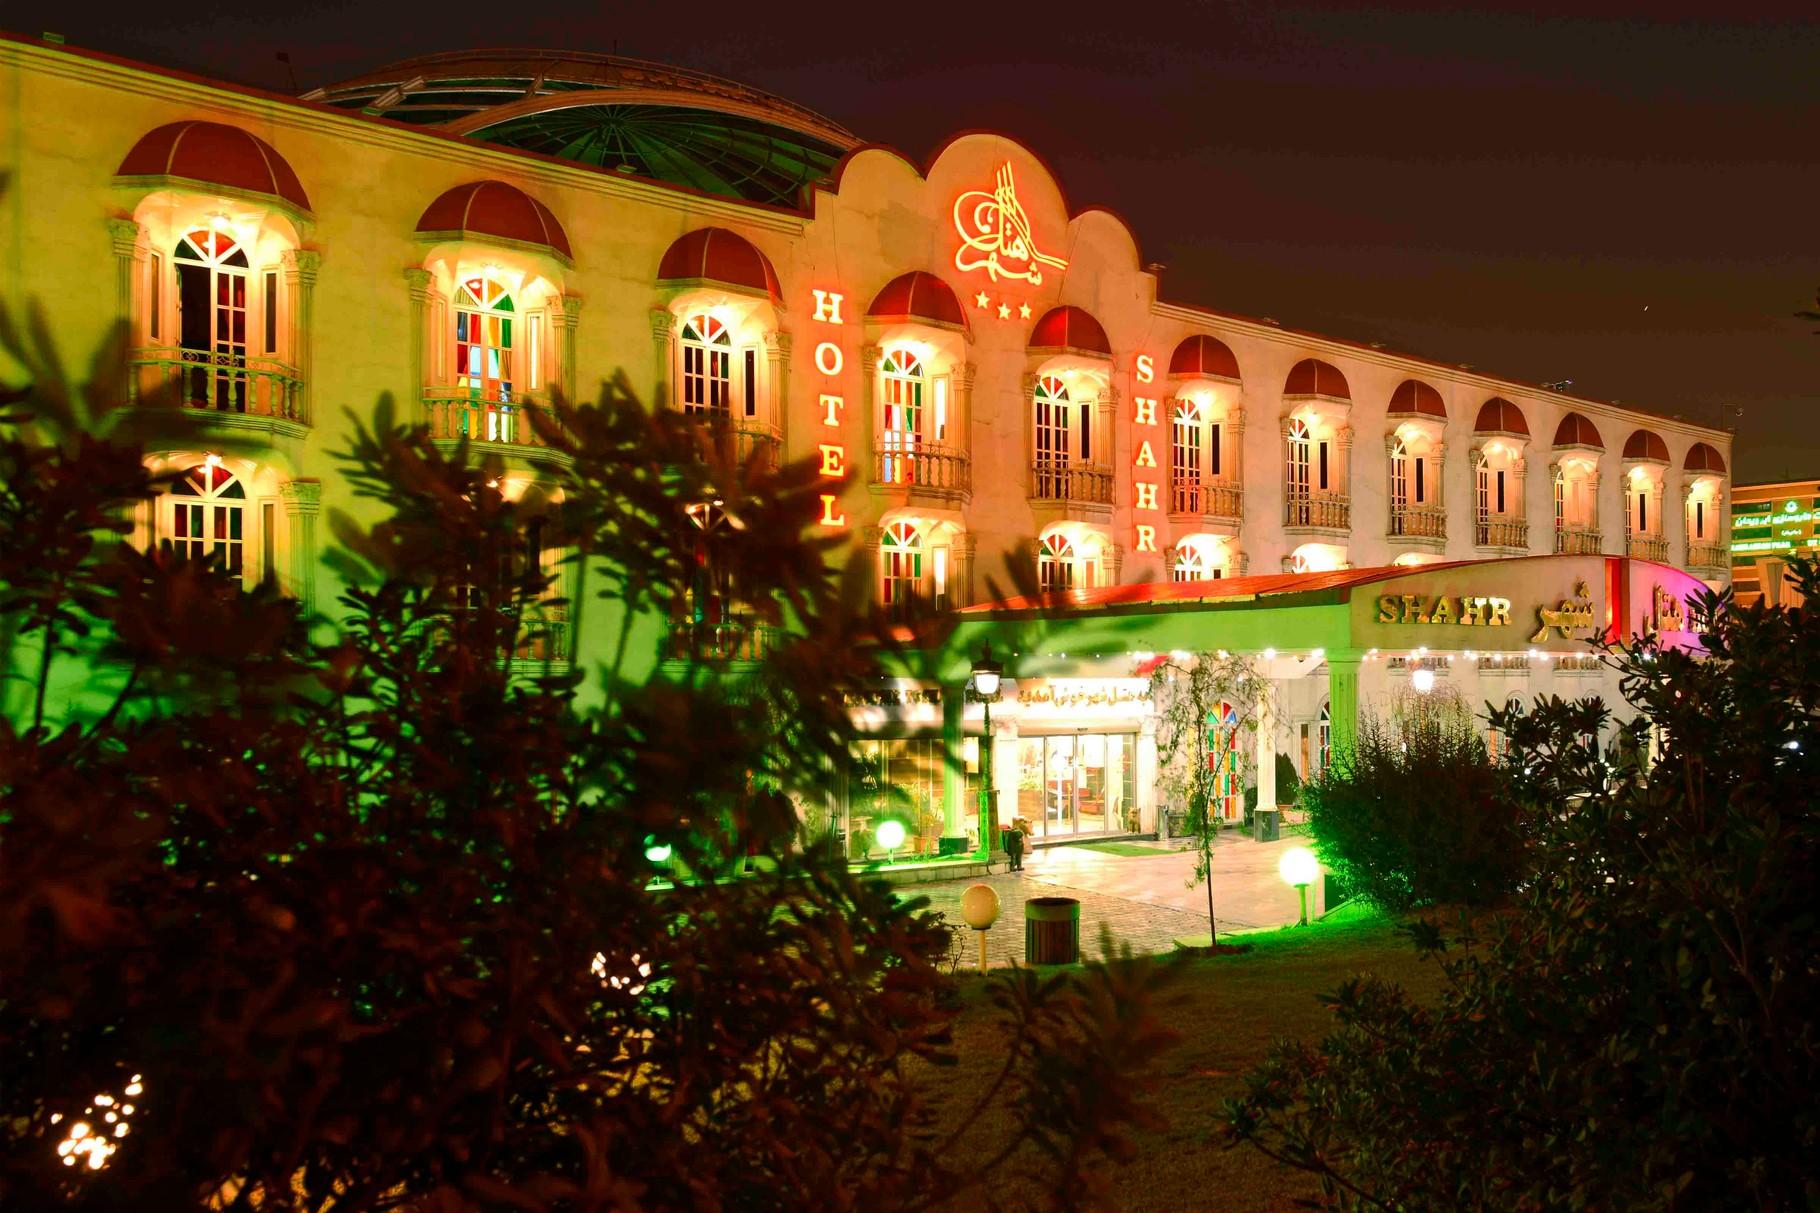 Hotel Shahr